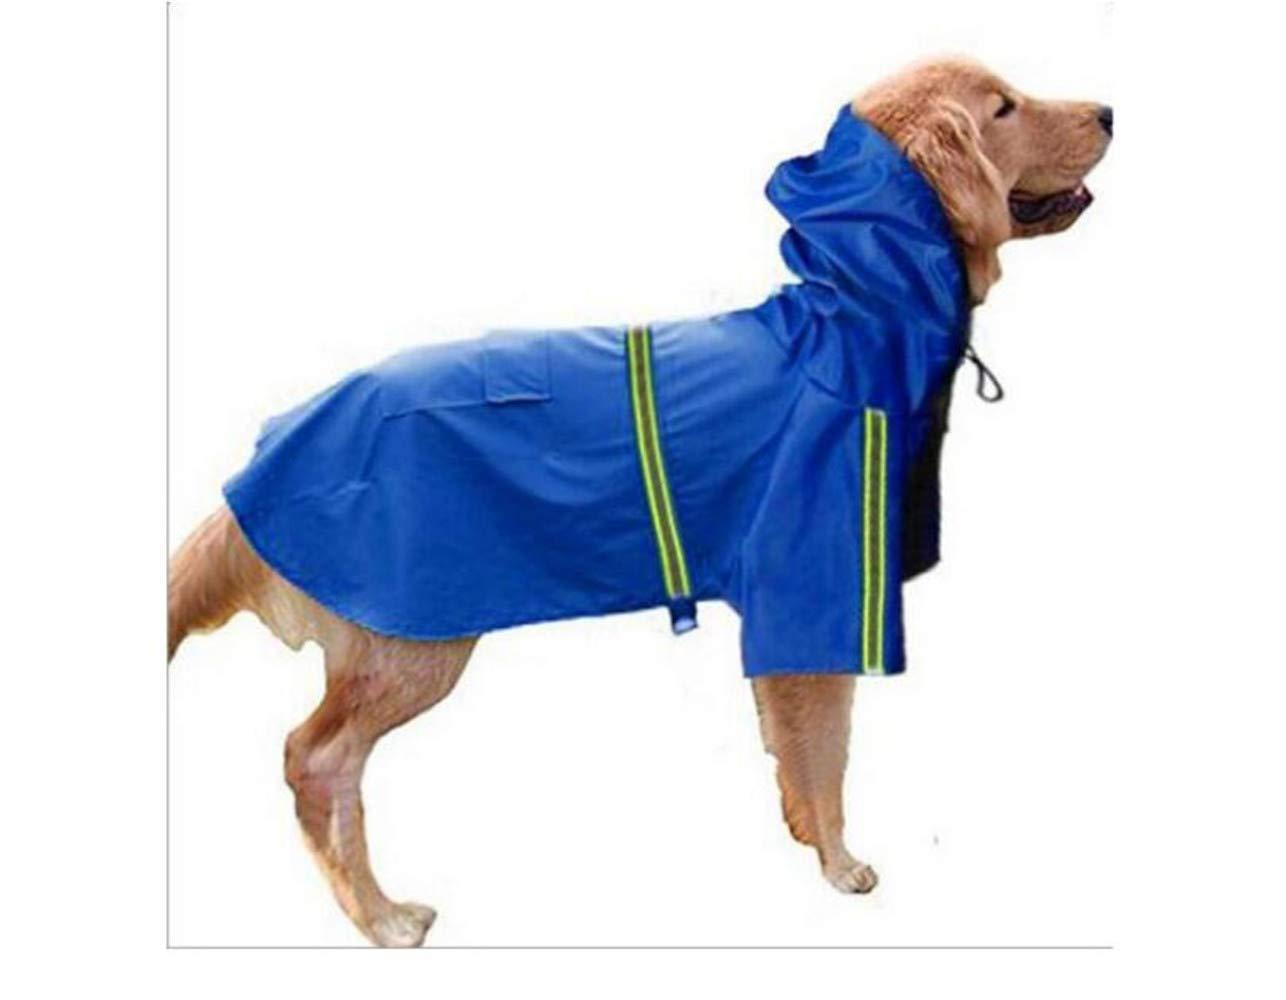 QICHE Pet Supplies Impermeabile Riflettente per Cani di Taglia Grande Impermeabile Grande Cane, L